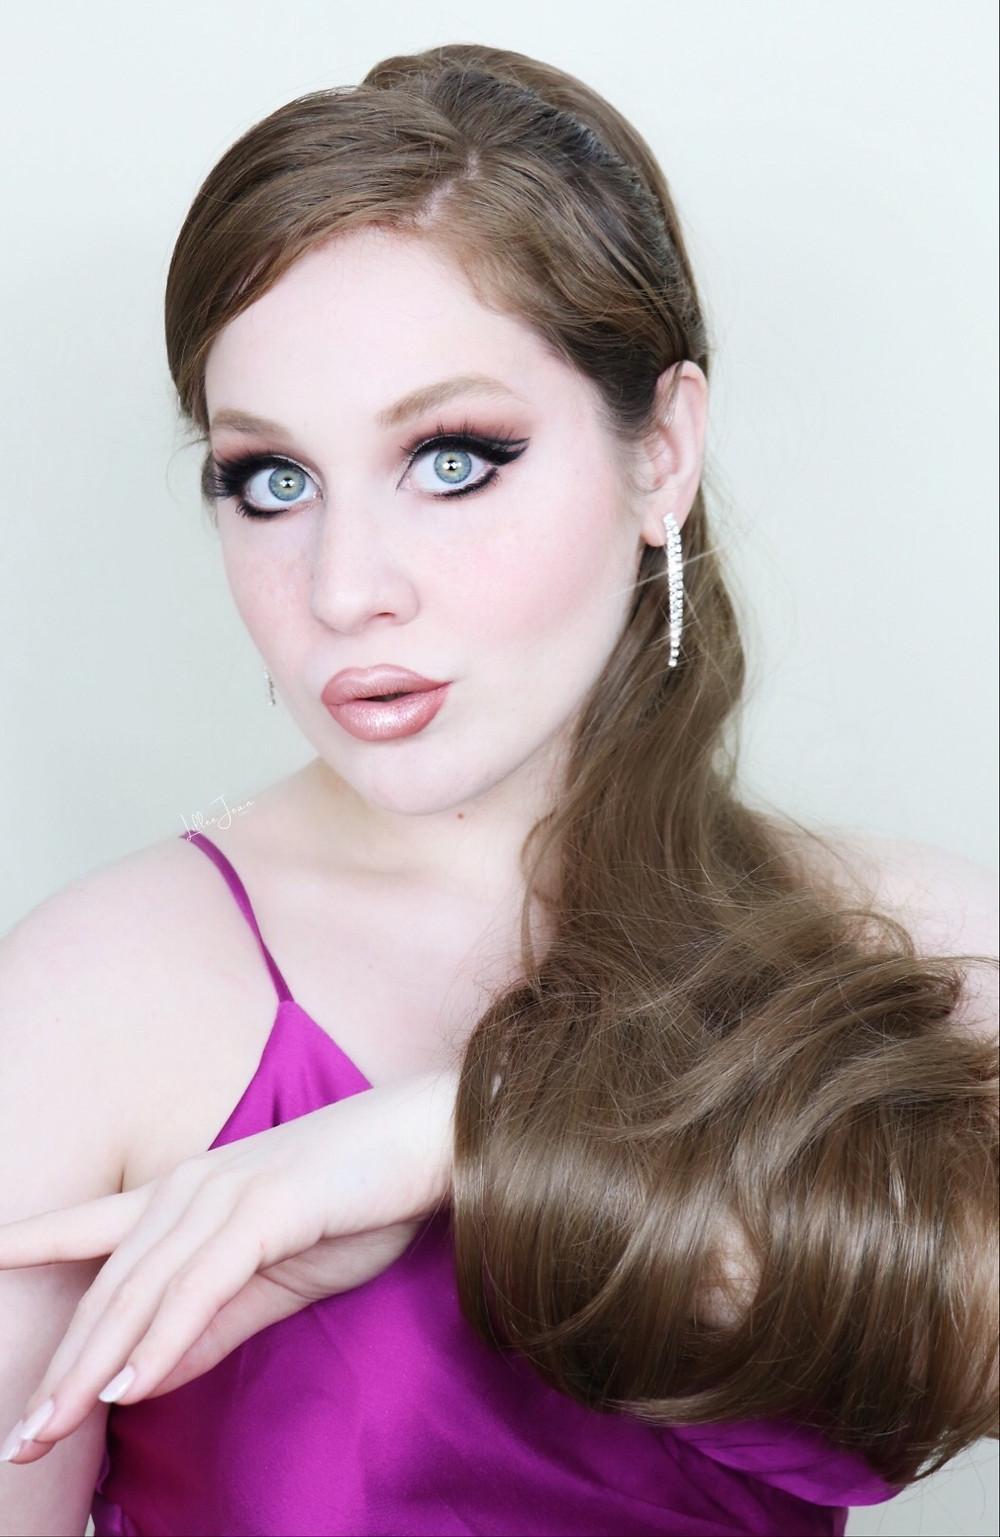 BRATZ Makeup Look   TARTE MANEATER Soft Glam Tutorial 2021   Lillee Jean